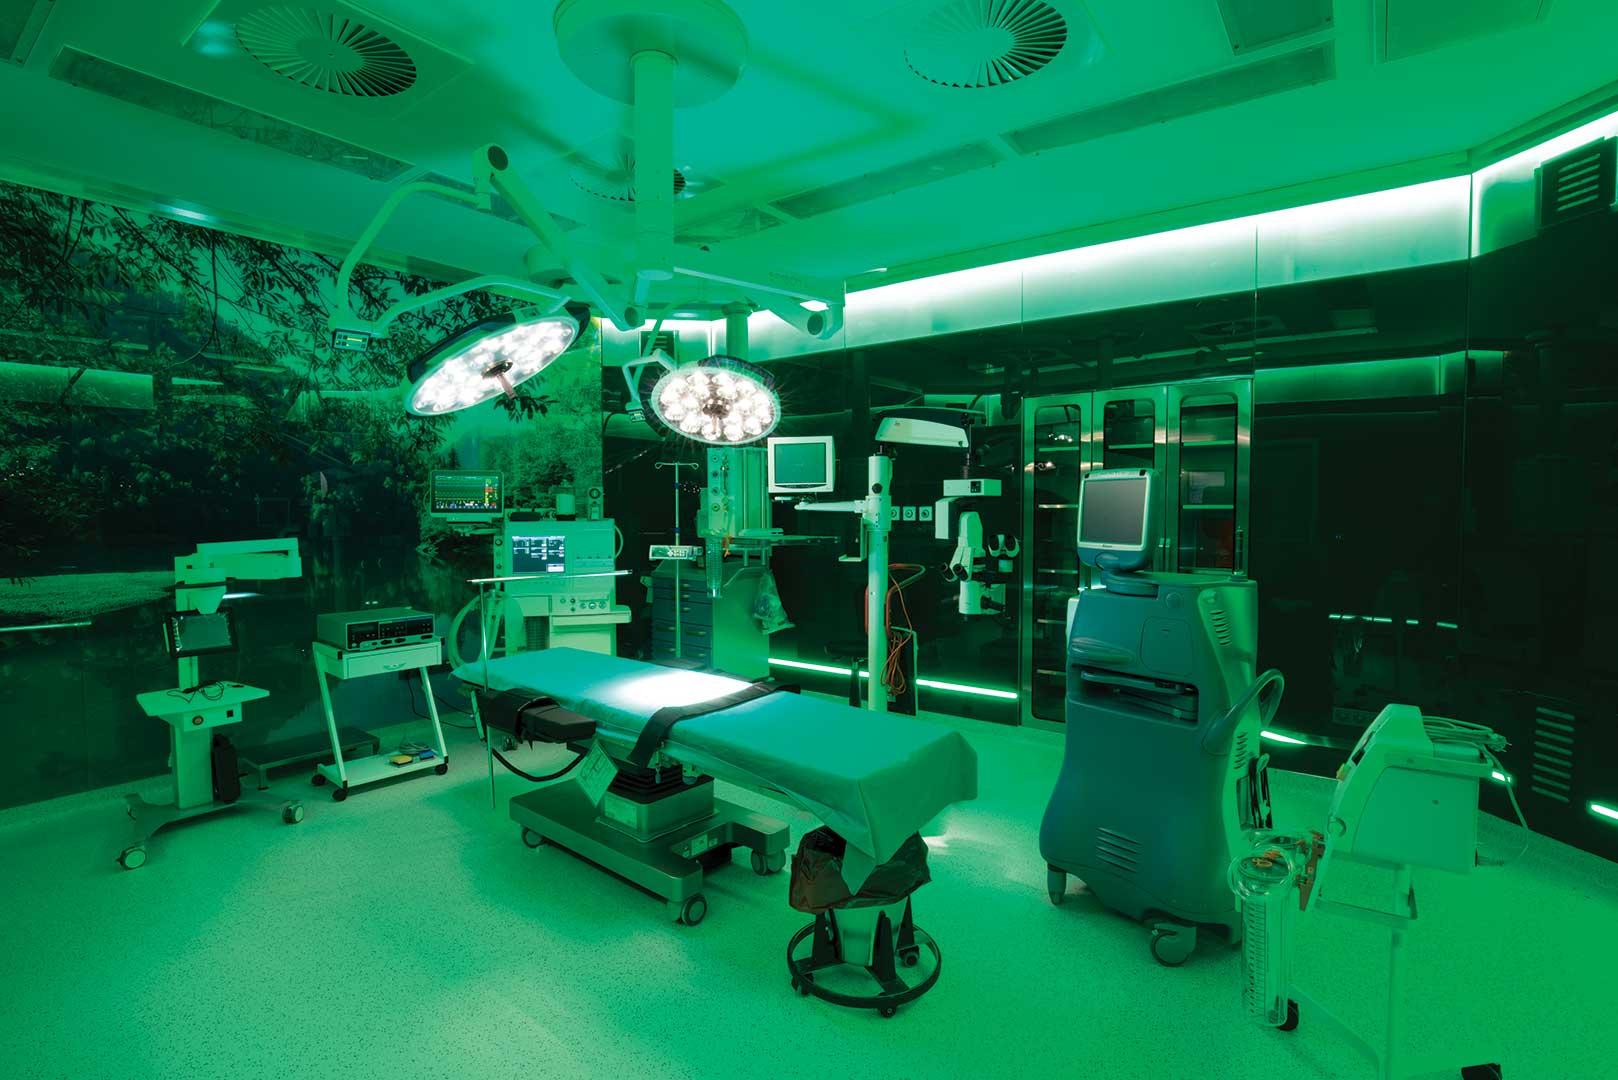 https://www.medicanahealthpoint.com/wp-content/uploads/2021/03/medicana-atasehir-hastanesi-ameliyathane.jpg